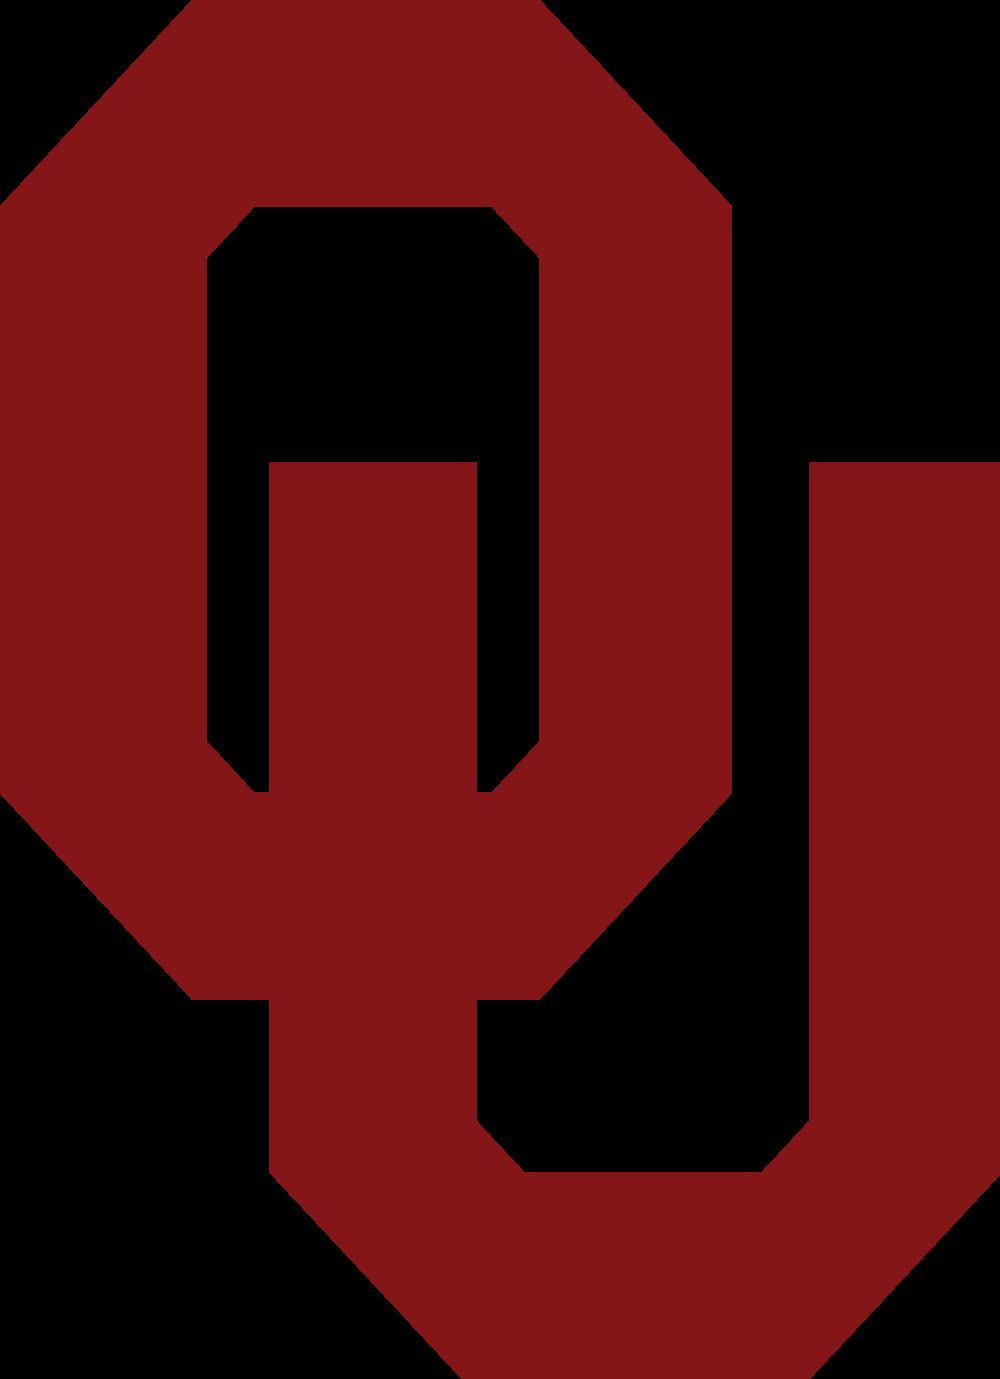 Oklahoma football clipart clipart black and white University of Oklahoma Sooners, NCAA Division I/Big 12 Conference ... clipart black and white